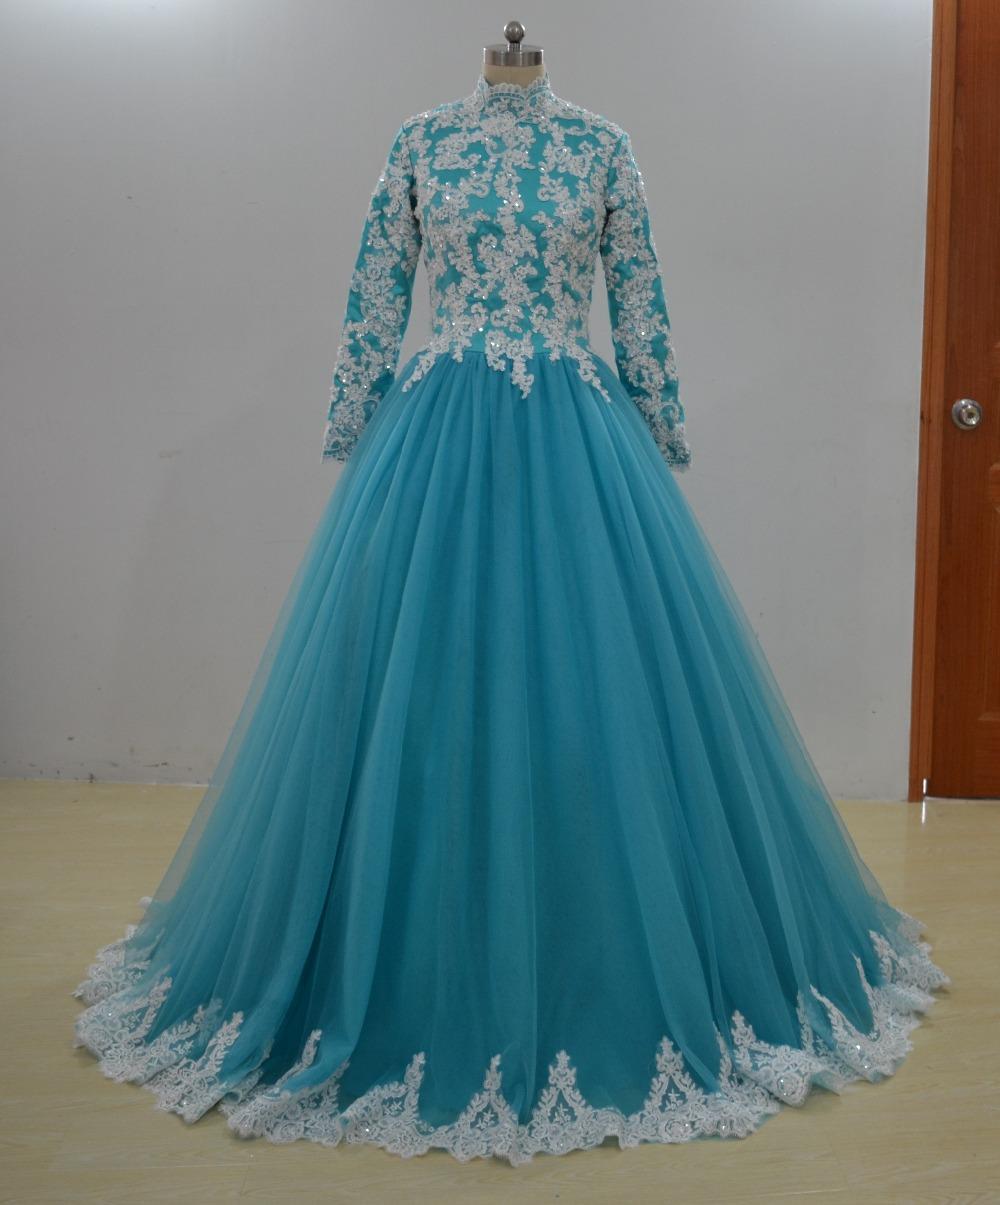 Dorable Islamic Wedding Dresses With Hijab Photos - All Wedding ...